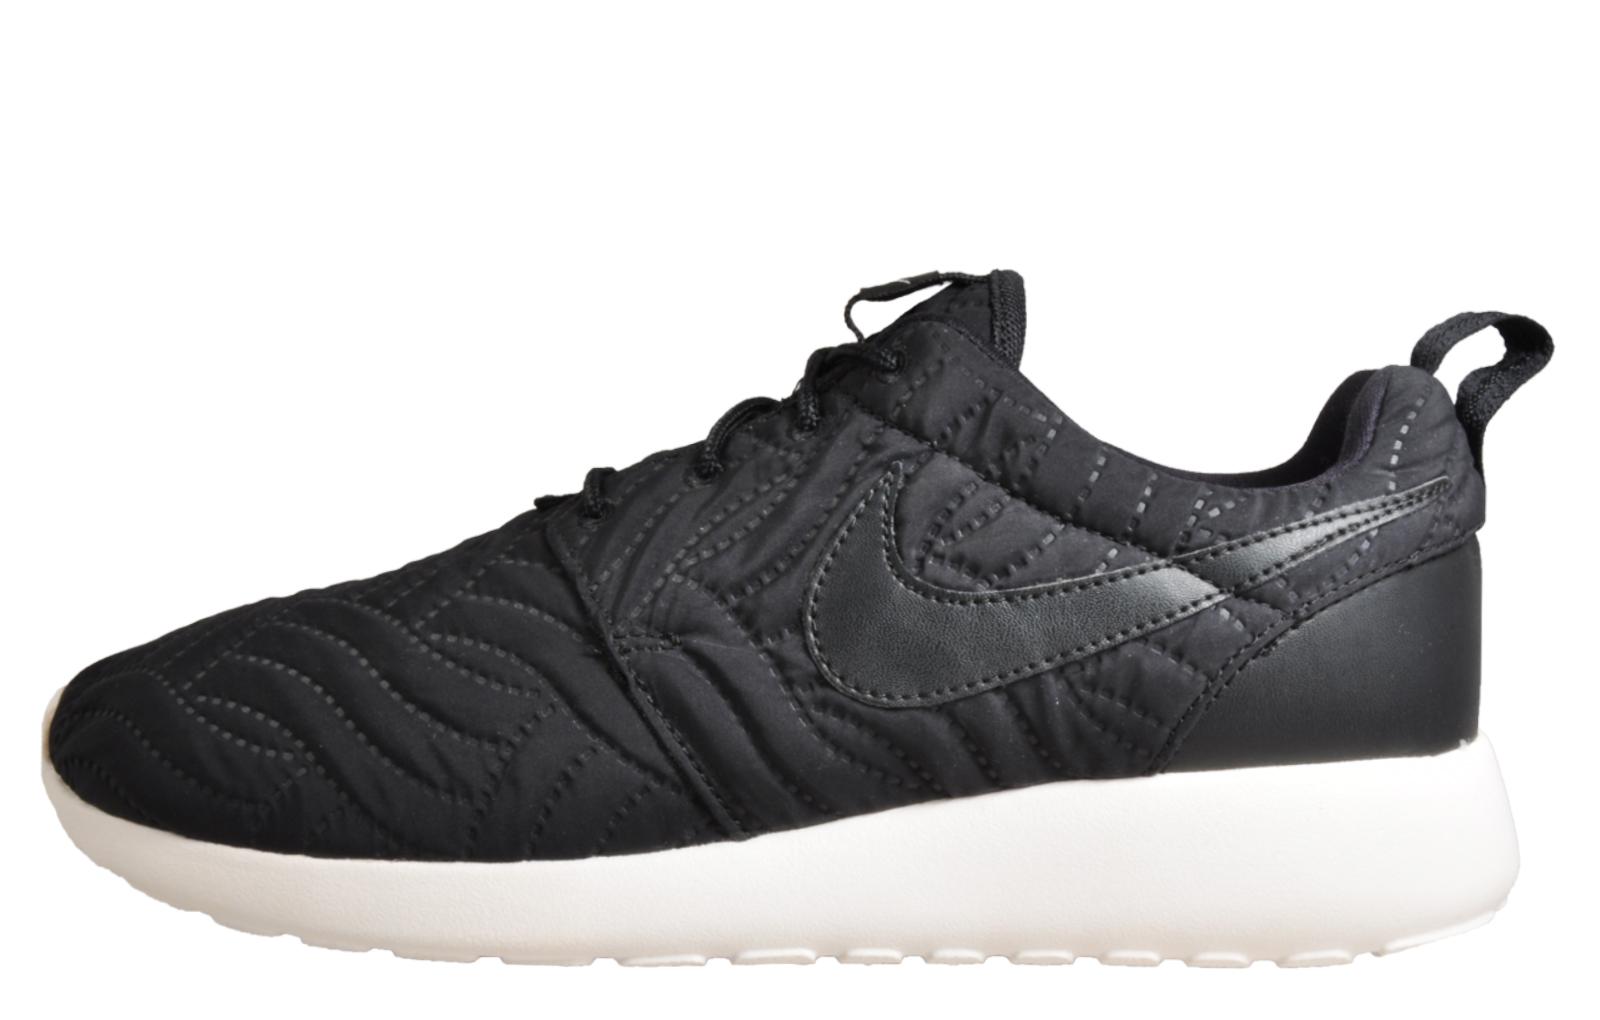 low priced c3f5c 01e51 Nike Roshe One Premium Womens -